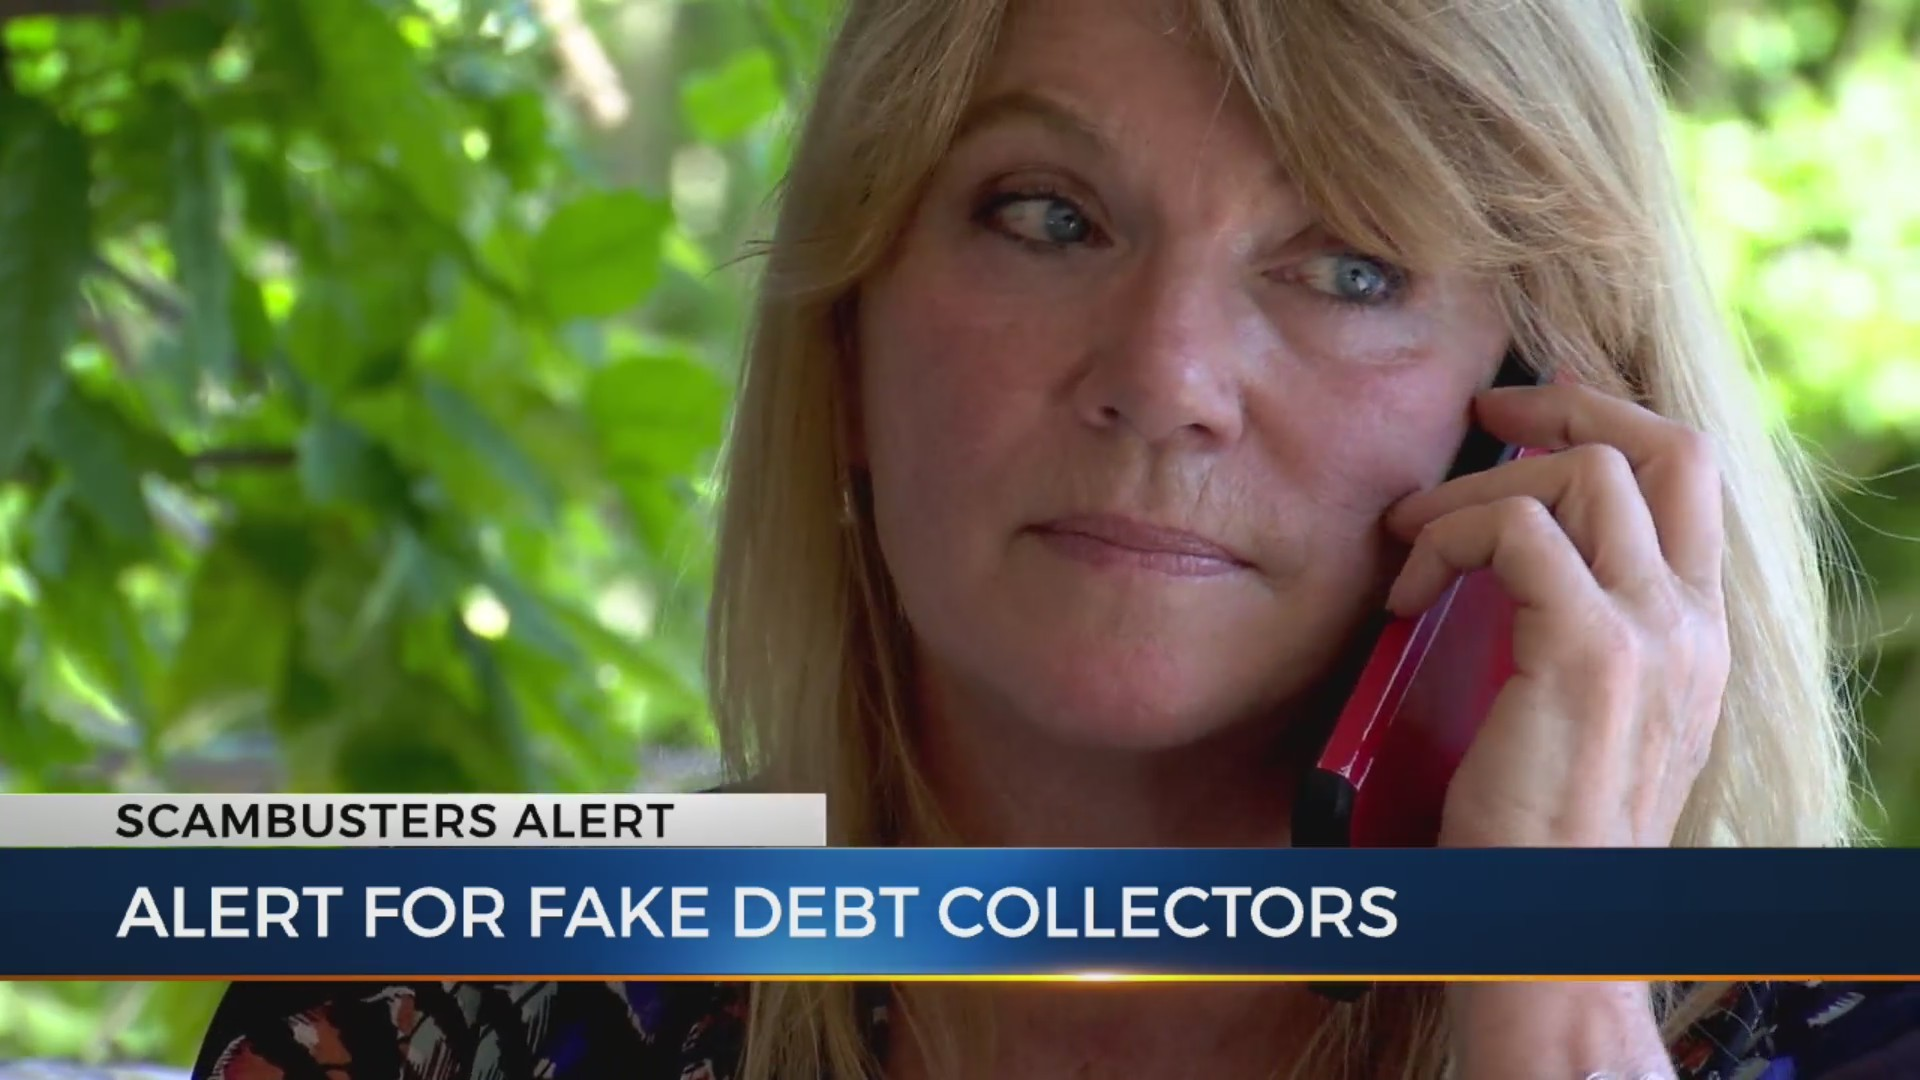 Debt_collection_scam_0_20190518040400